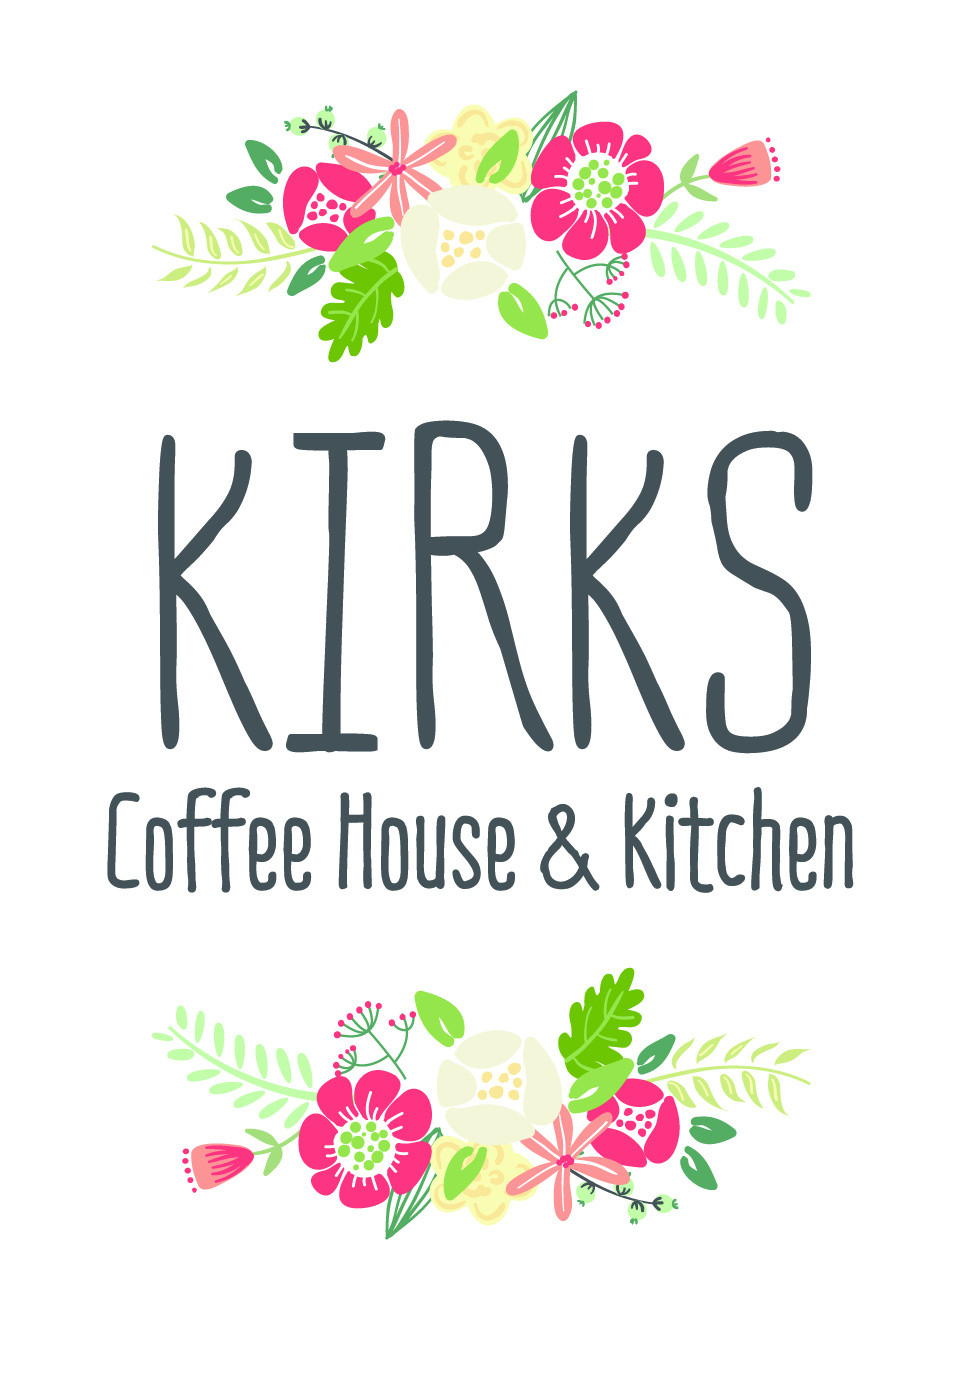 Kirks Coffee House